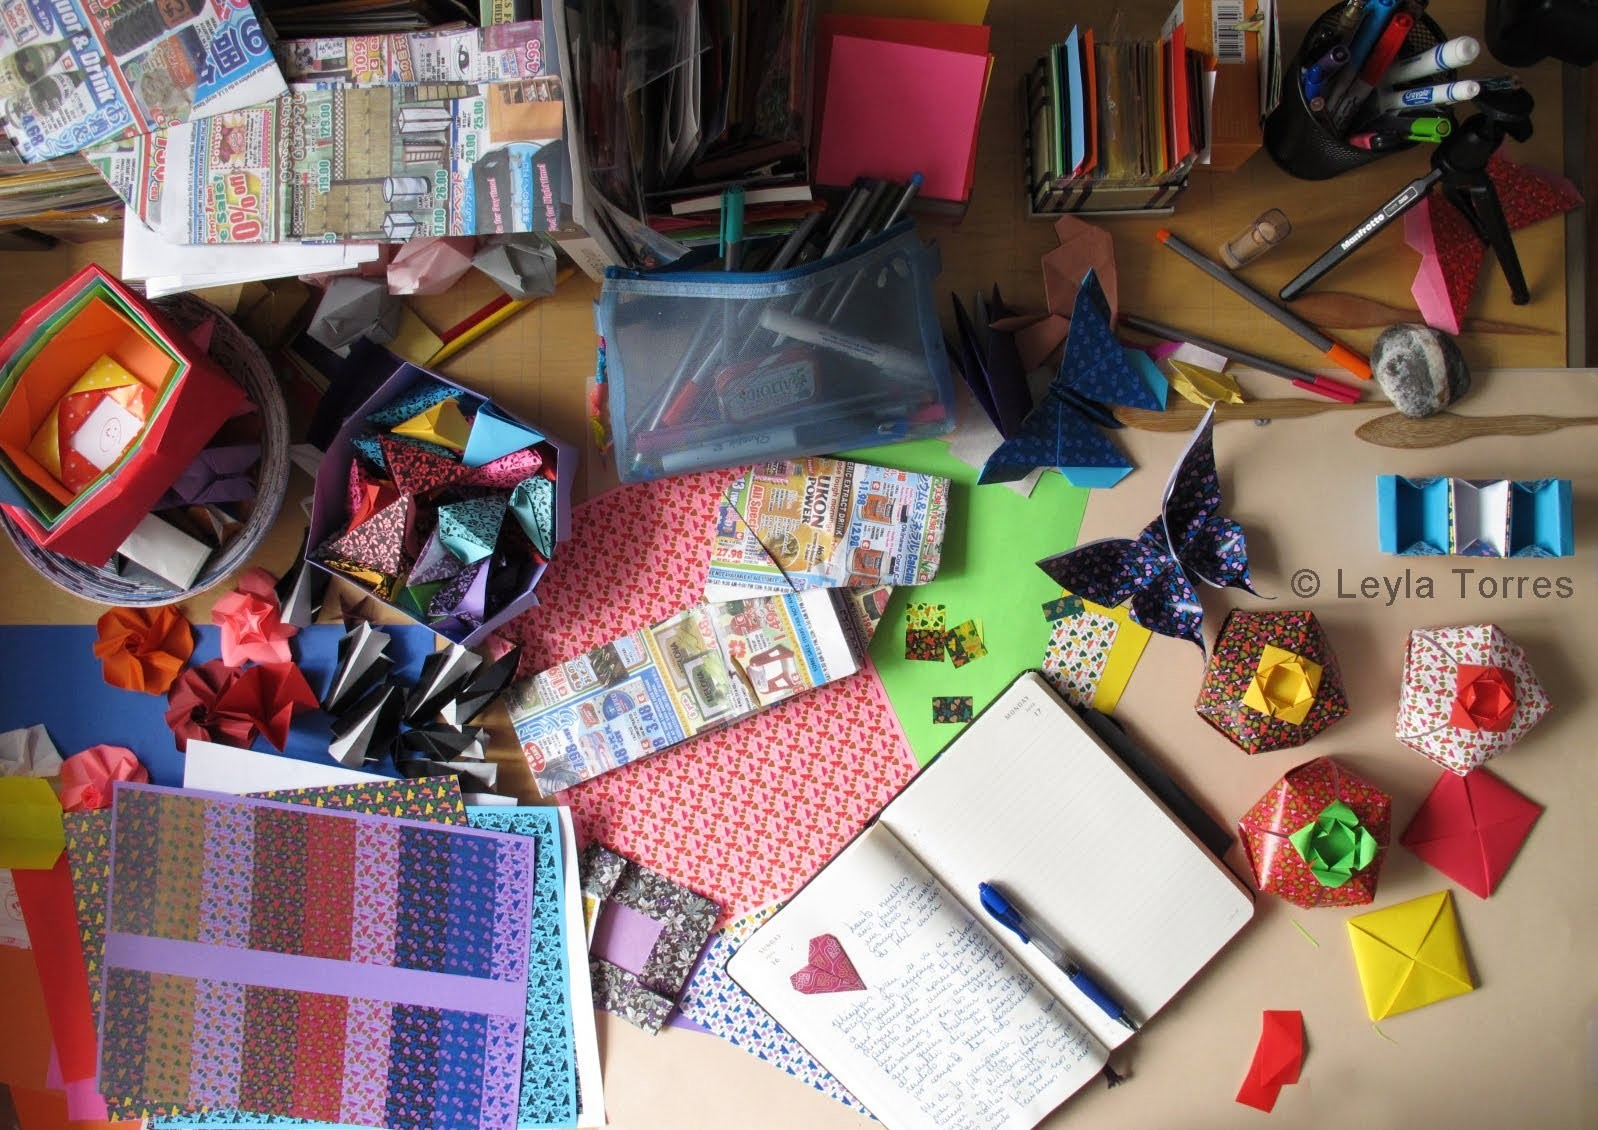 Leyla's Origami Table 2013 :: La mesa del origami